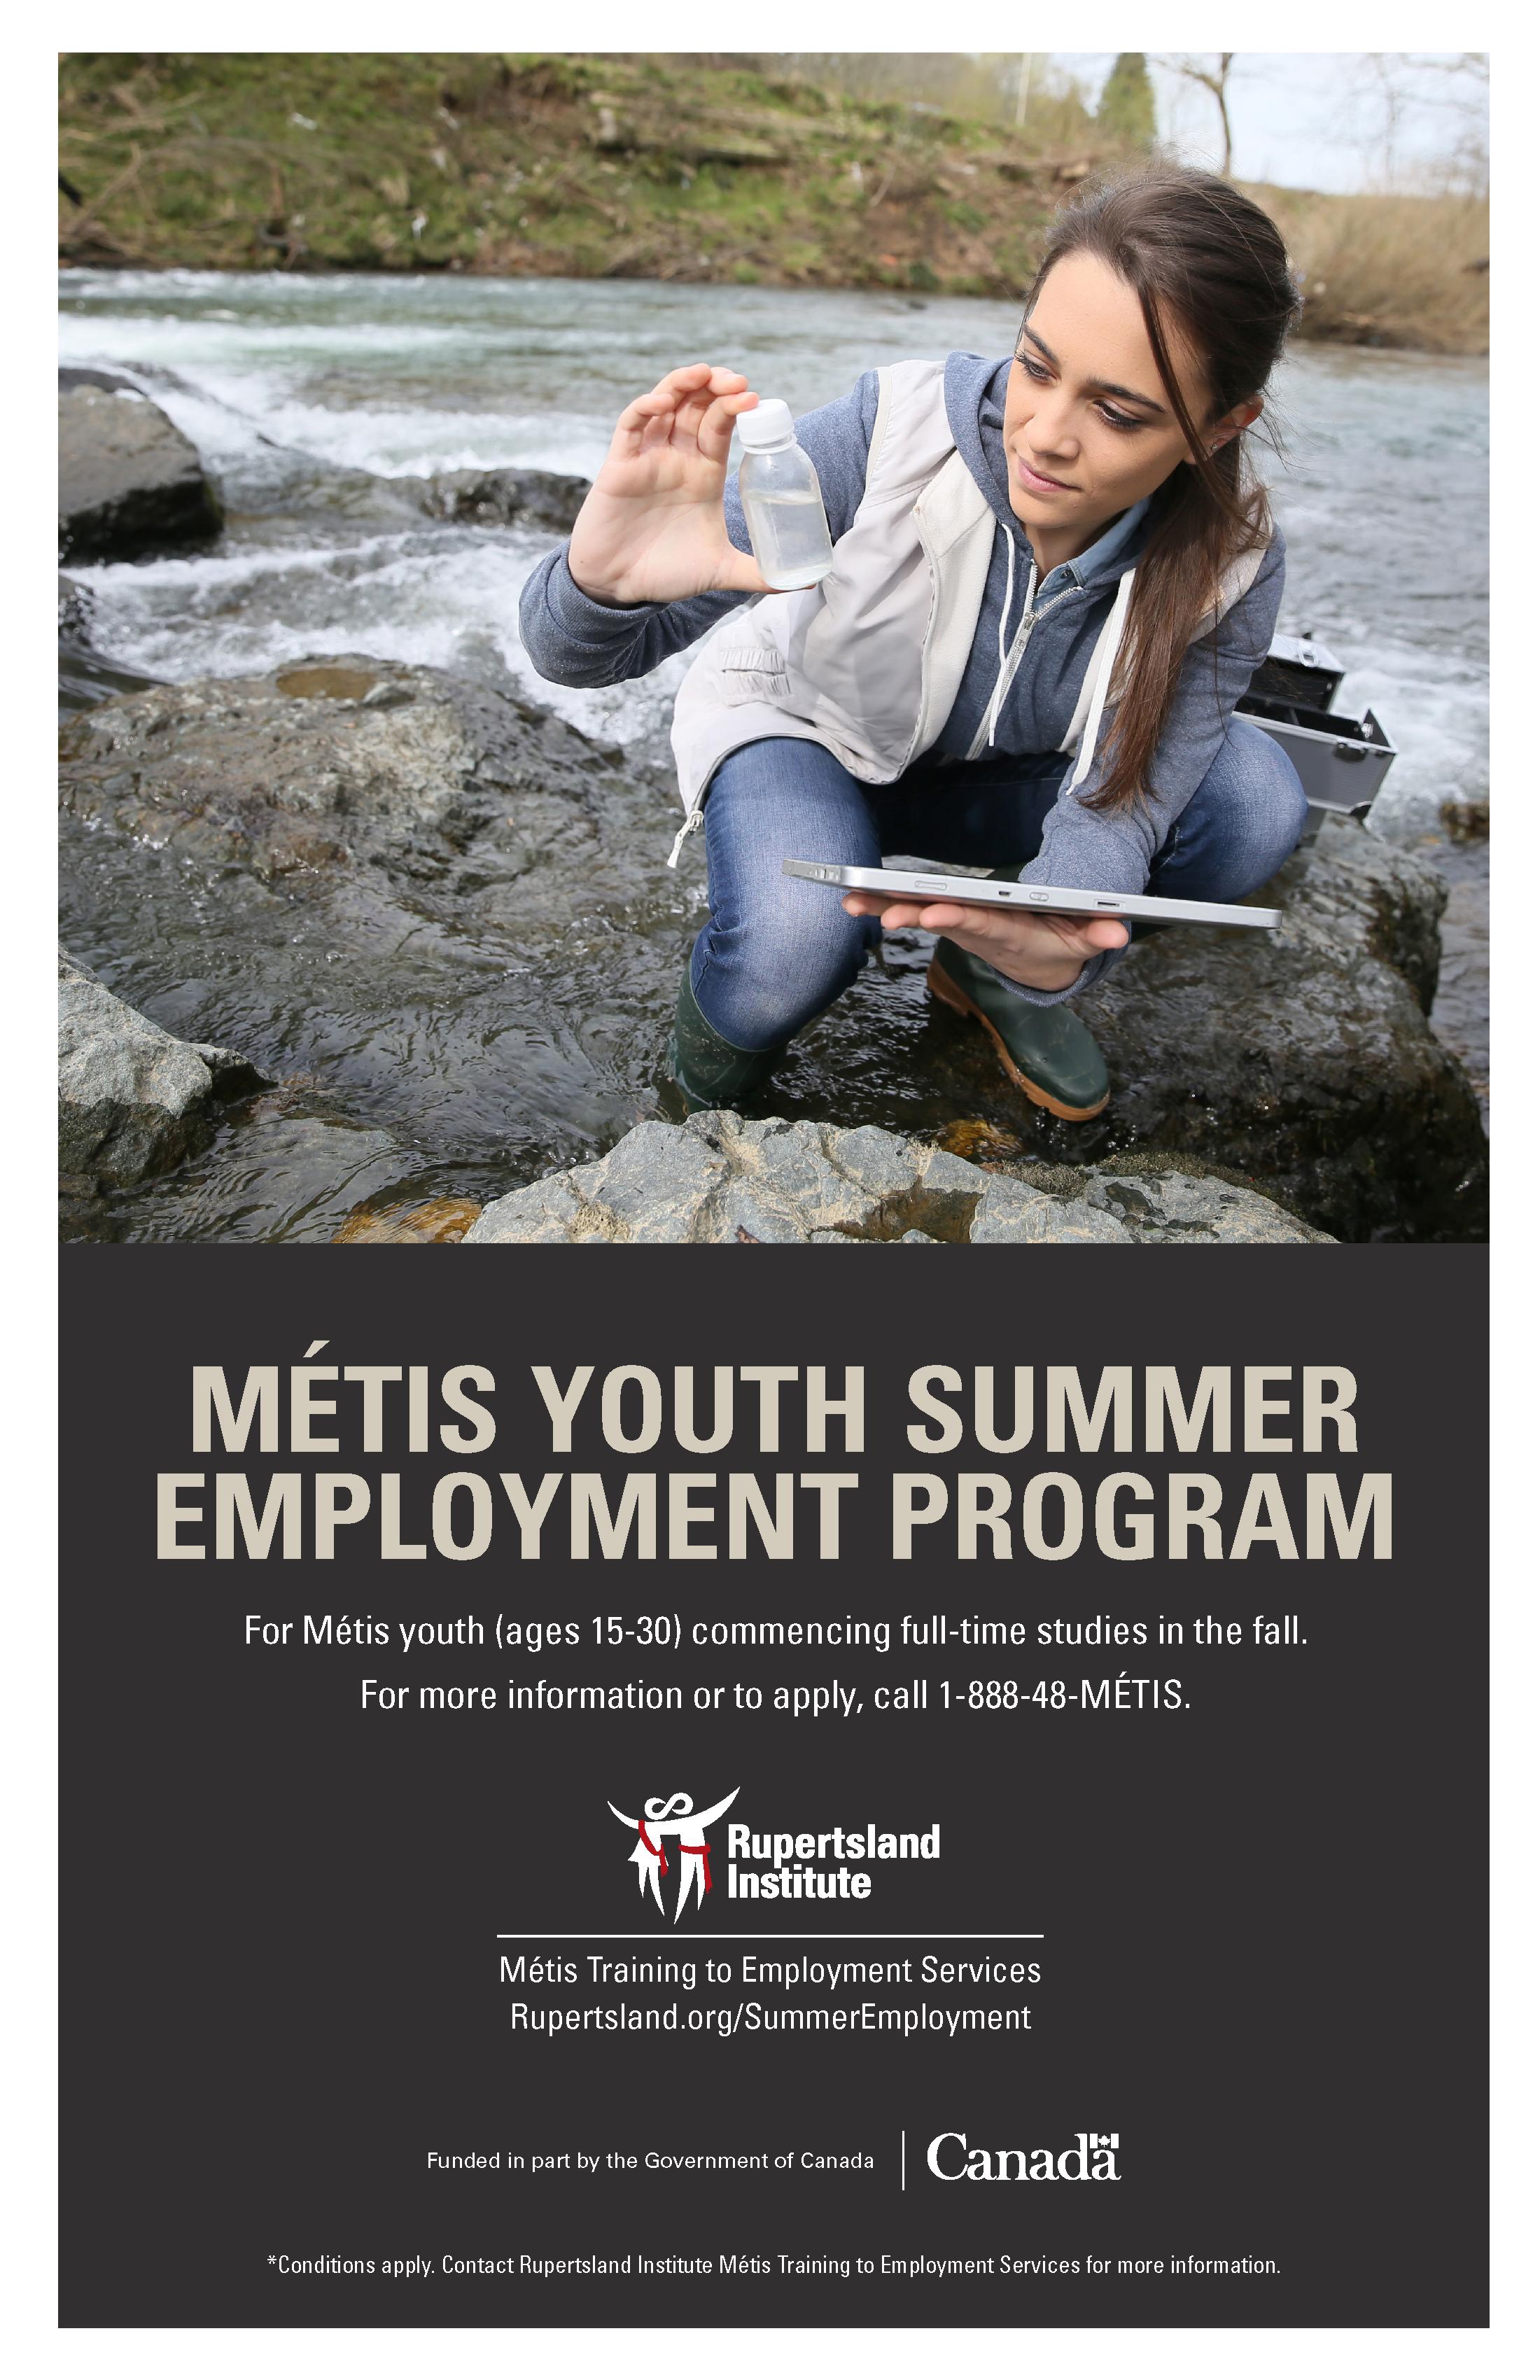 MÉTIS YOUTH SUMMER EMPLOYMENT PROGRAM